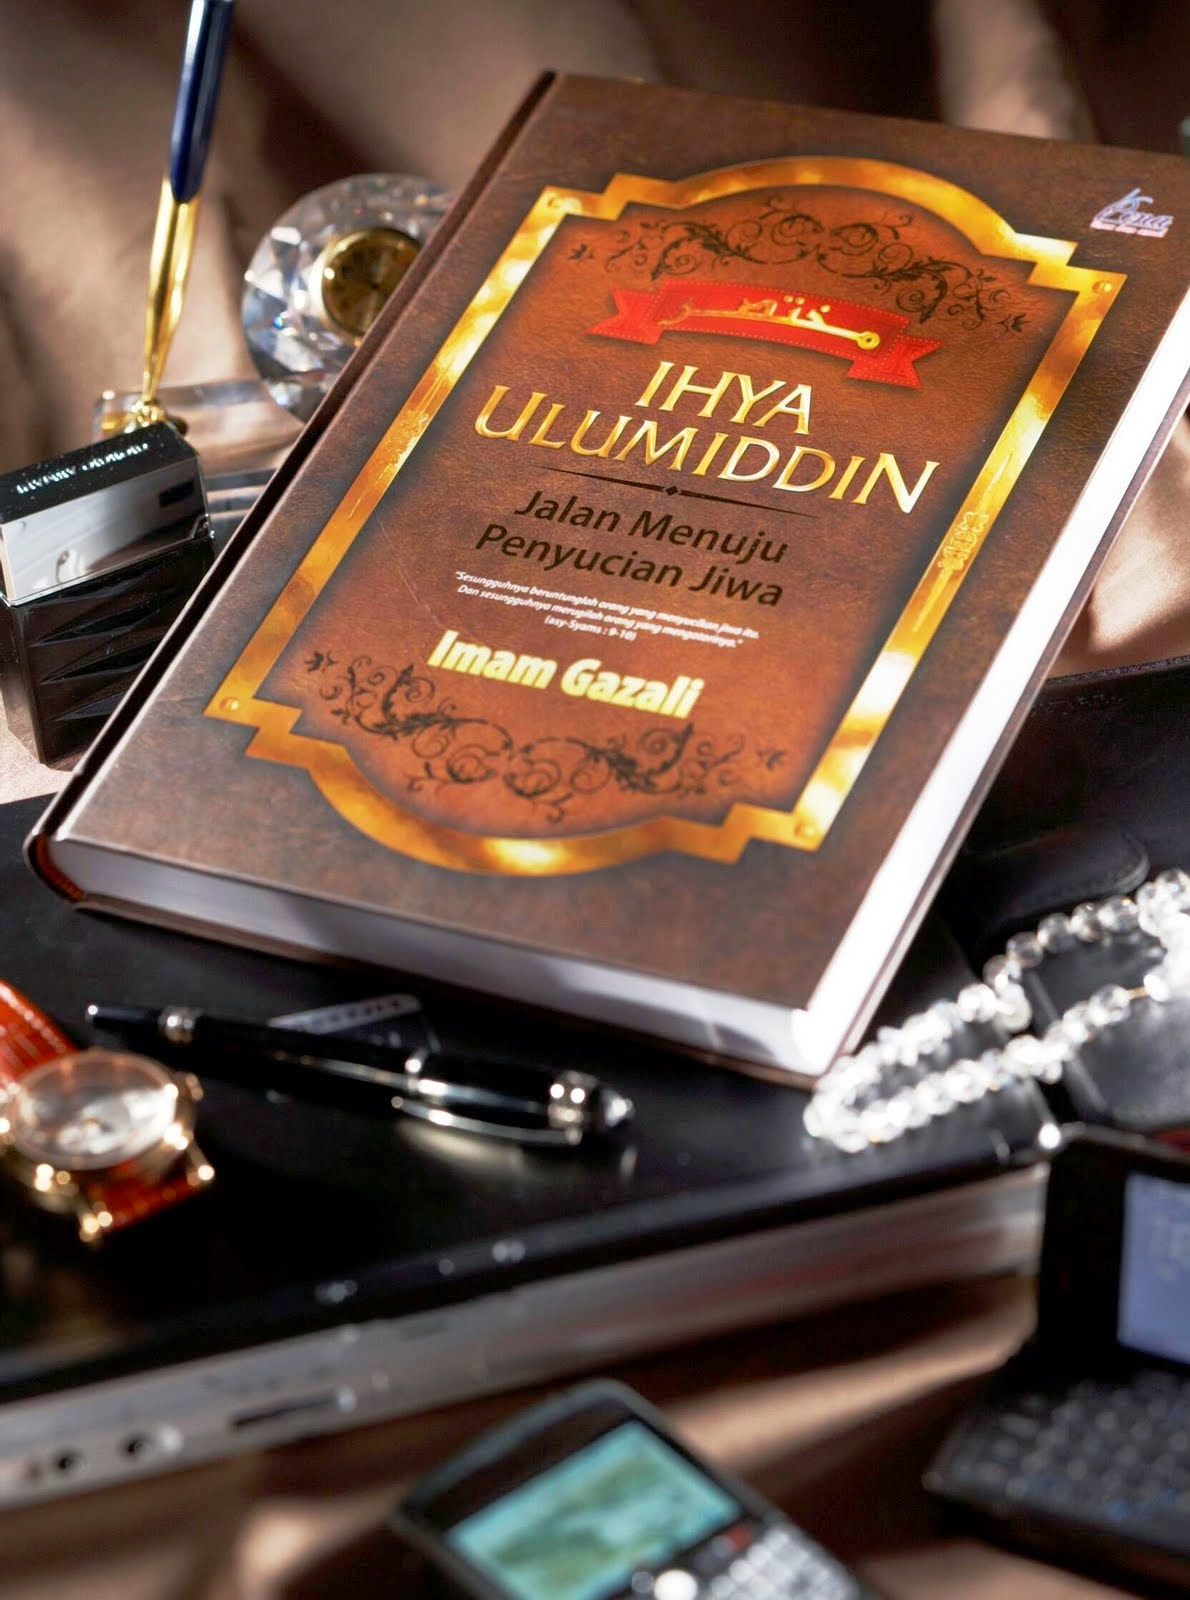 Kitab terjemahan ulumuddin ebook ihya